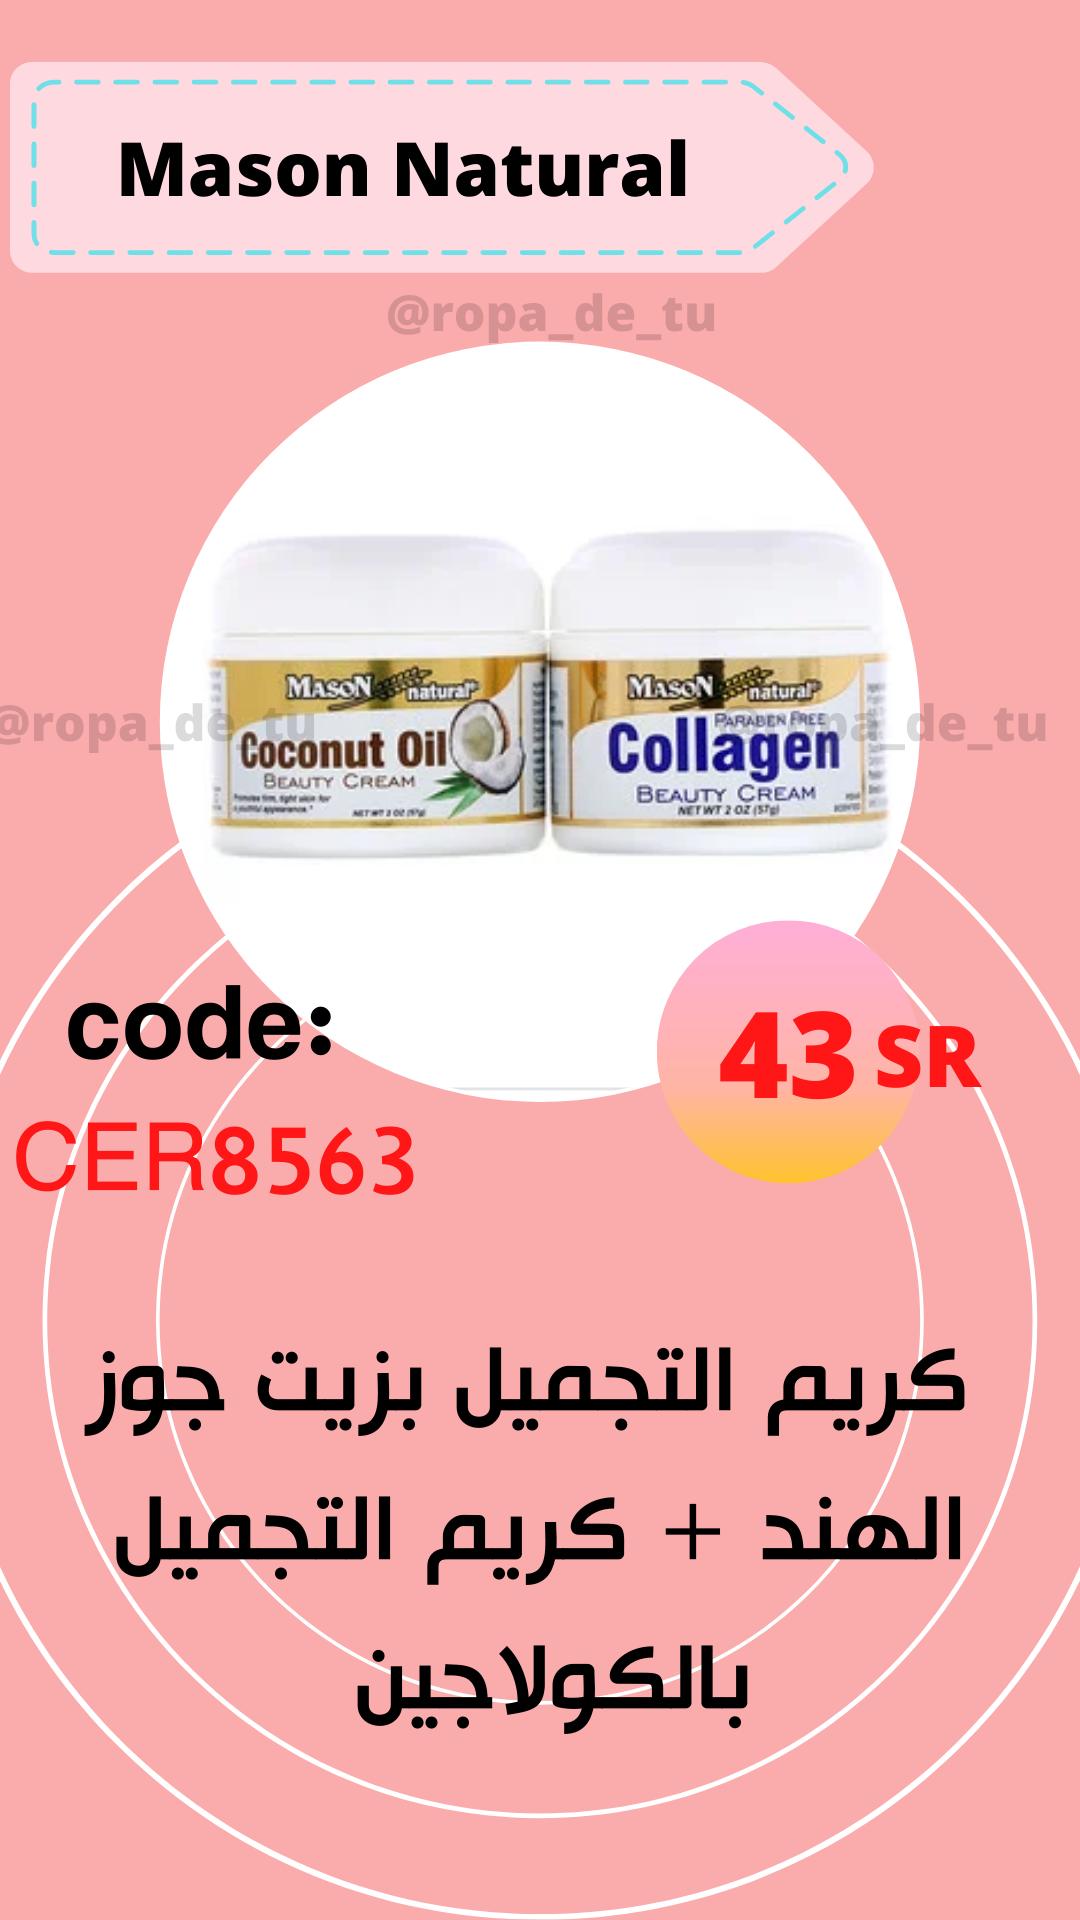 Mason Natural كريم البشرة الغني بزيت جوز الهند كريم البشرة الغني بالكولاجين الفائق عبوتين 2 أونصة 57 جم لكل منها Beauty Cream Collagen Paraben